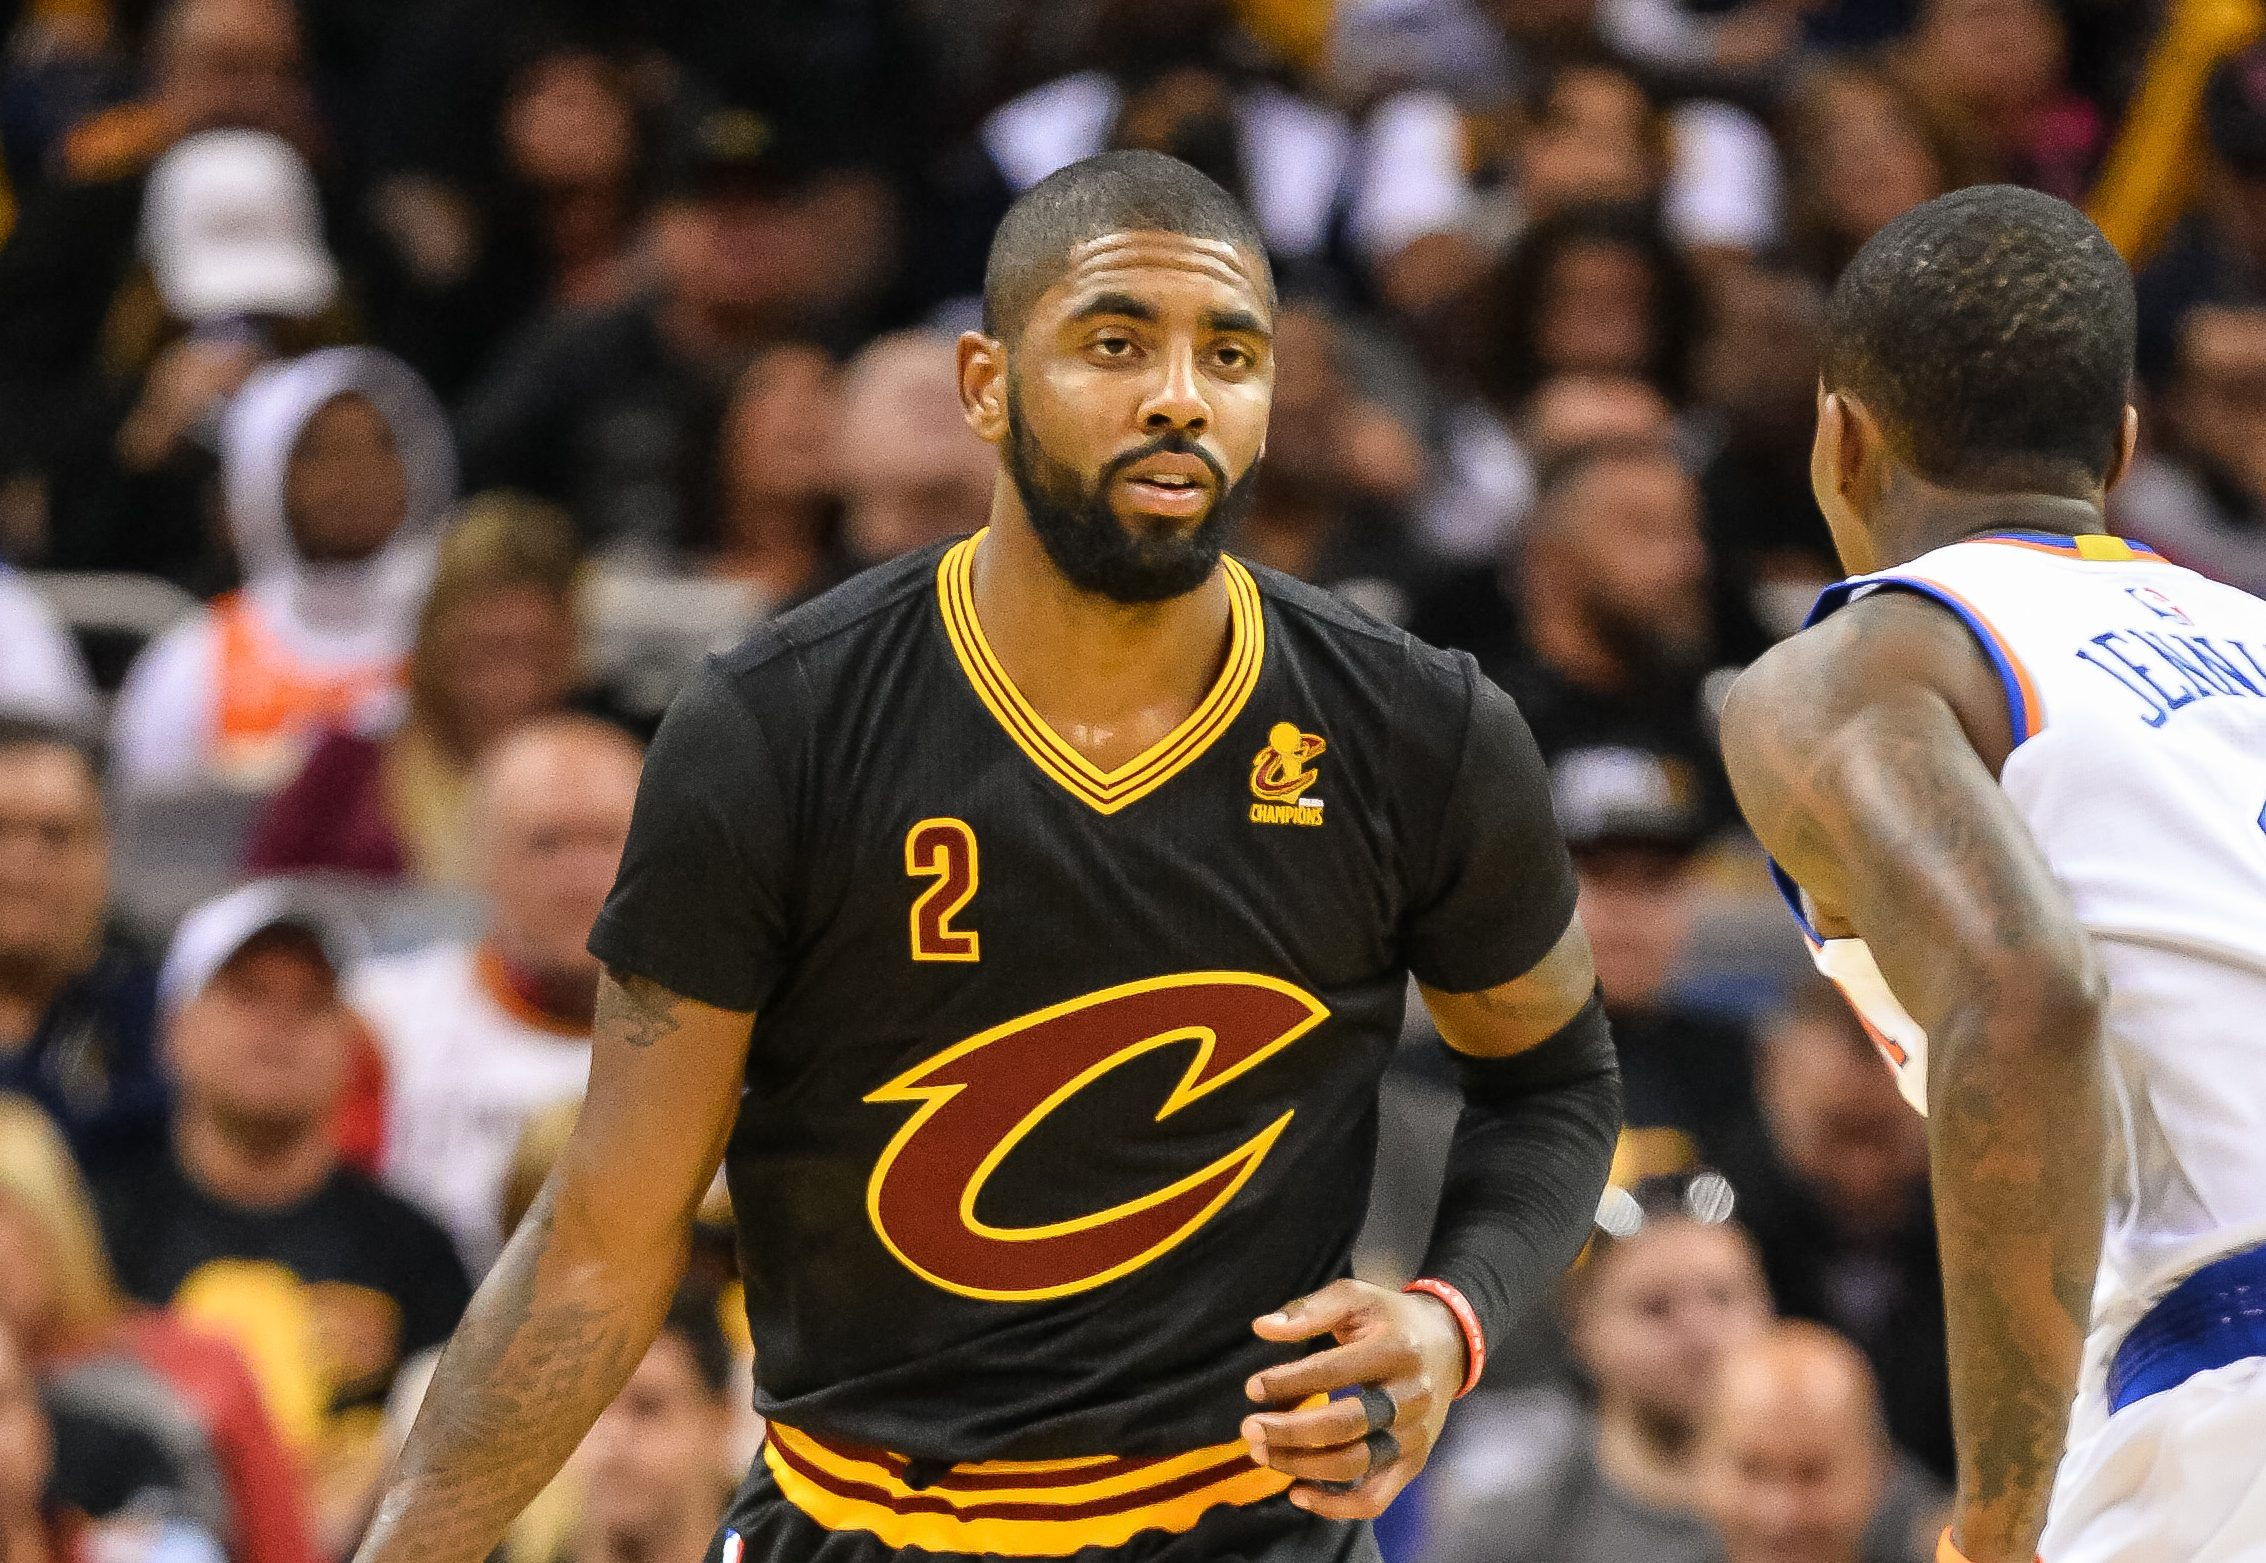 Kyrie Irving Knicks vs. Cavaliers